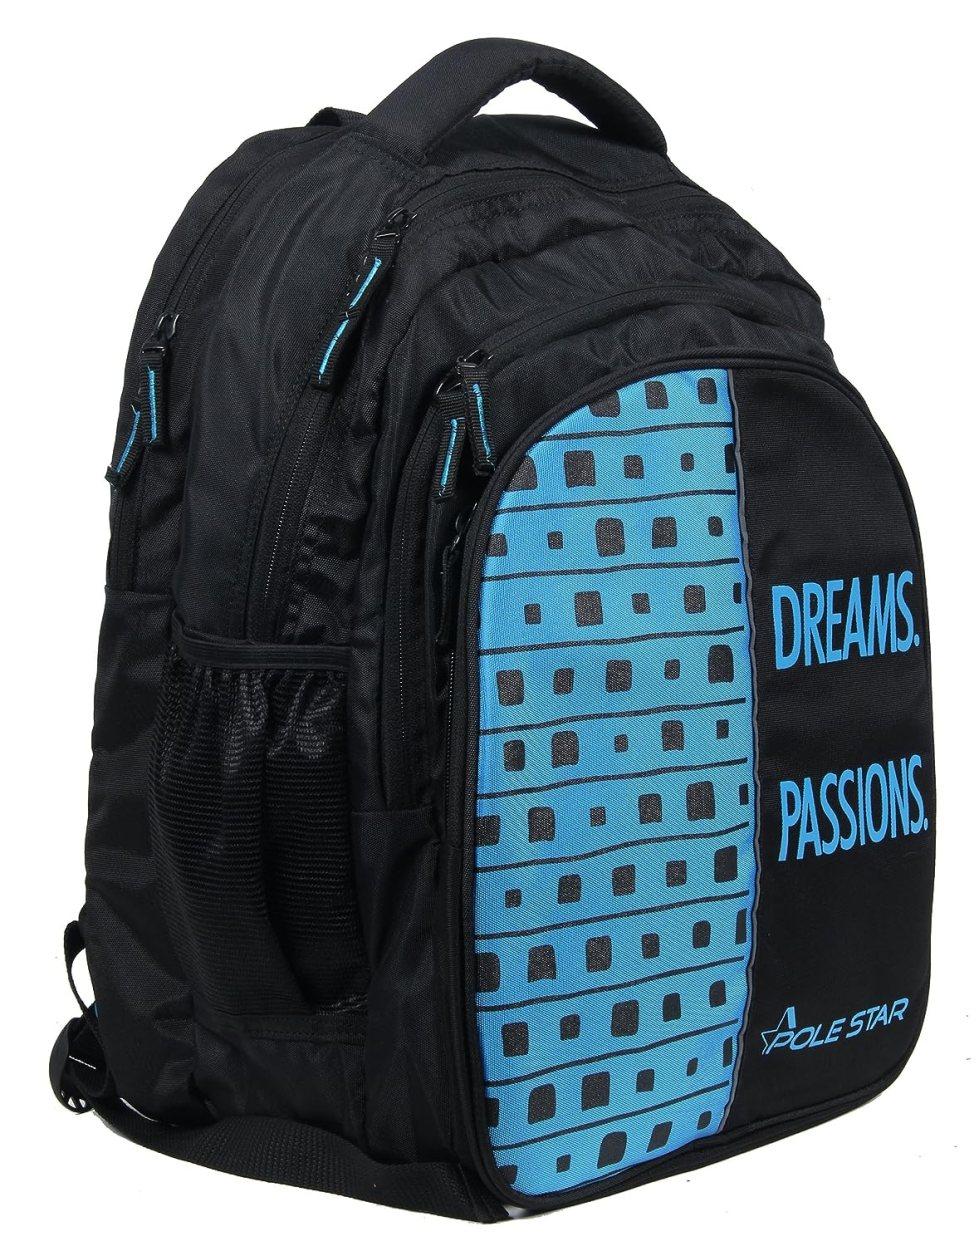 Big 4 Compartment 40 Lt Black Blue Laptop/Casual/Travel Backpack School under Polestar Travel Bag